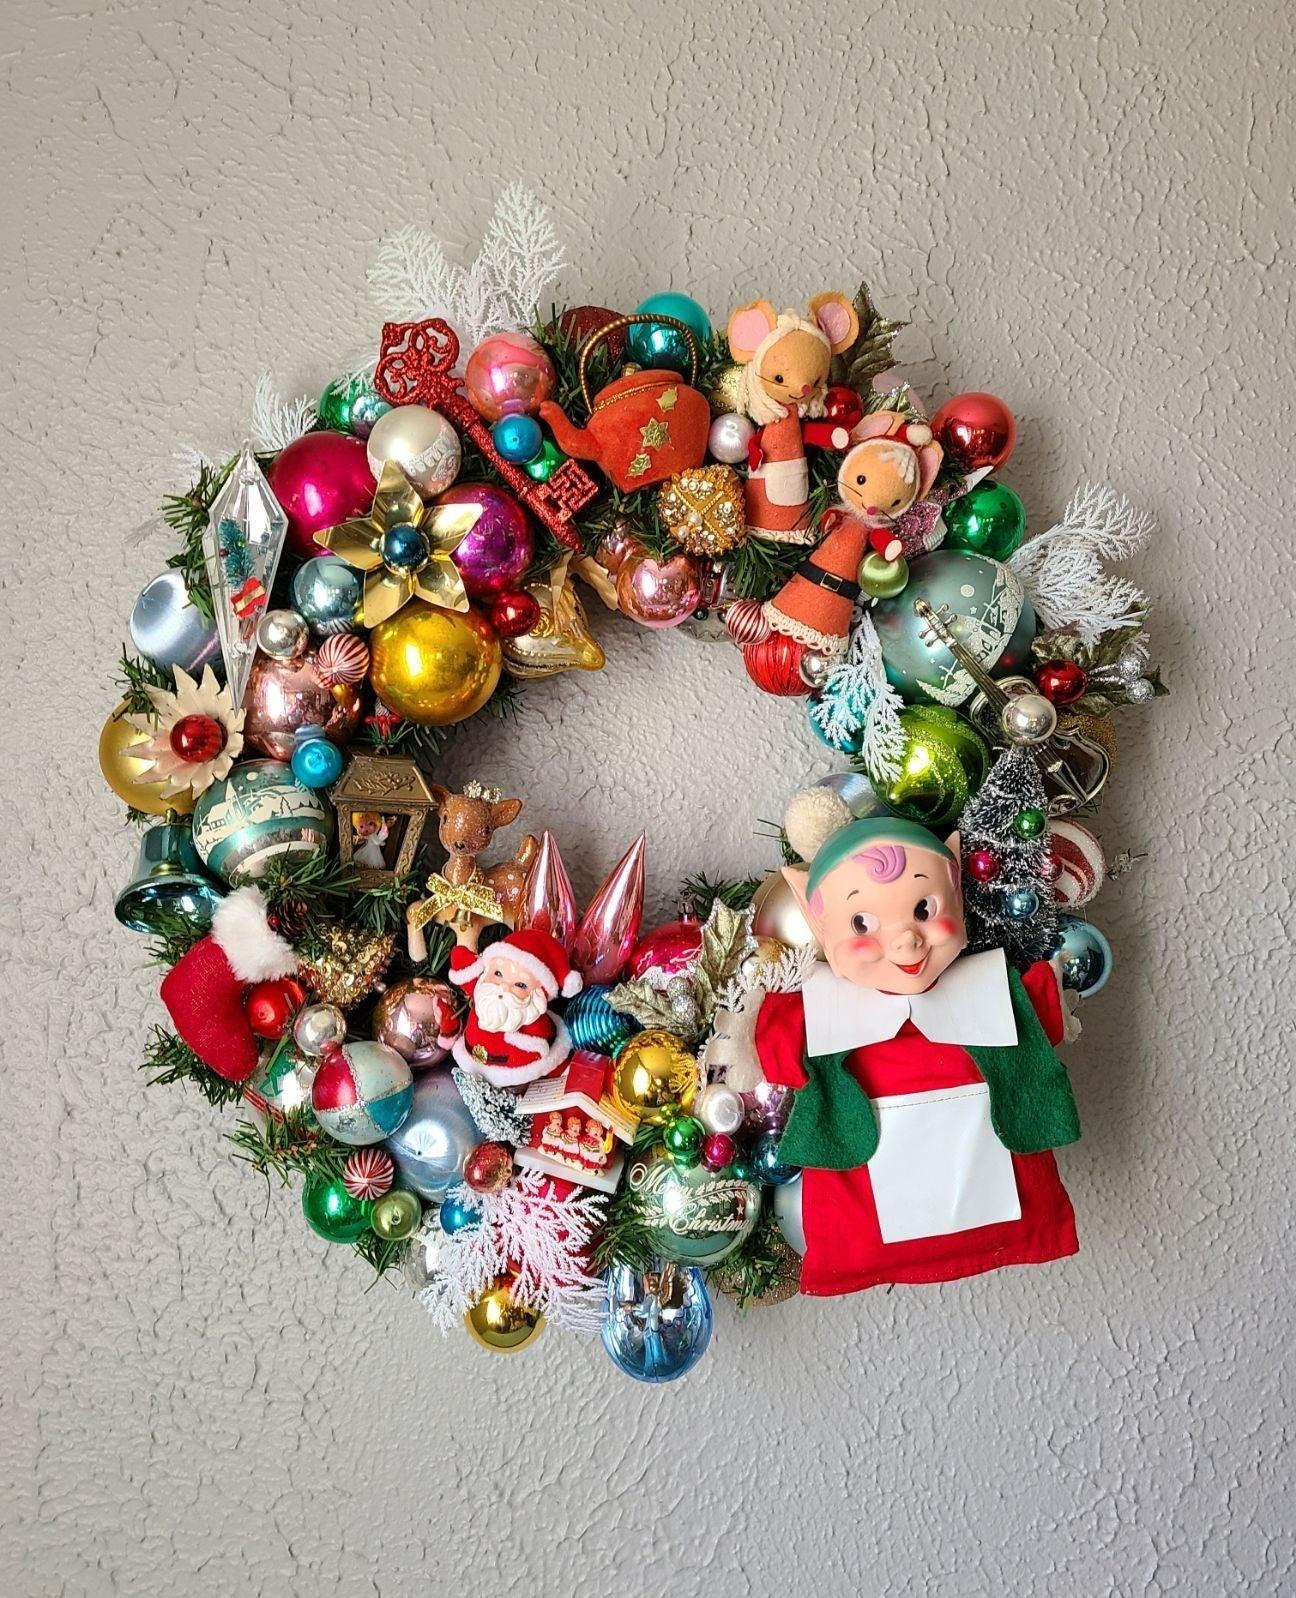 Retro Kresge Elf Mice Ornament Wreath